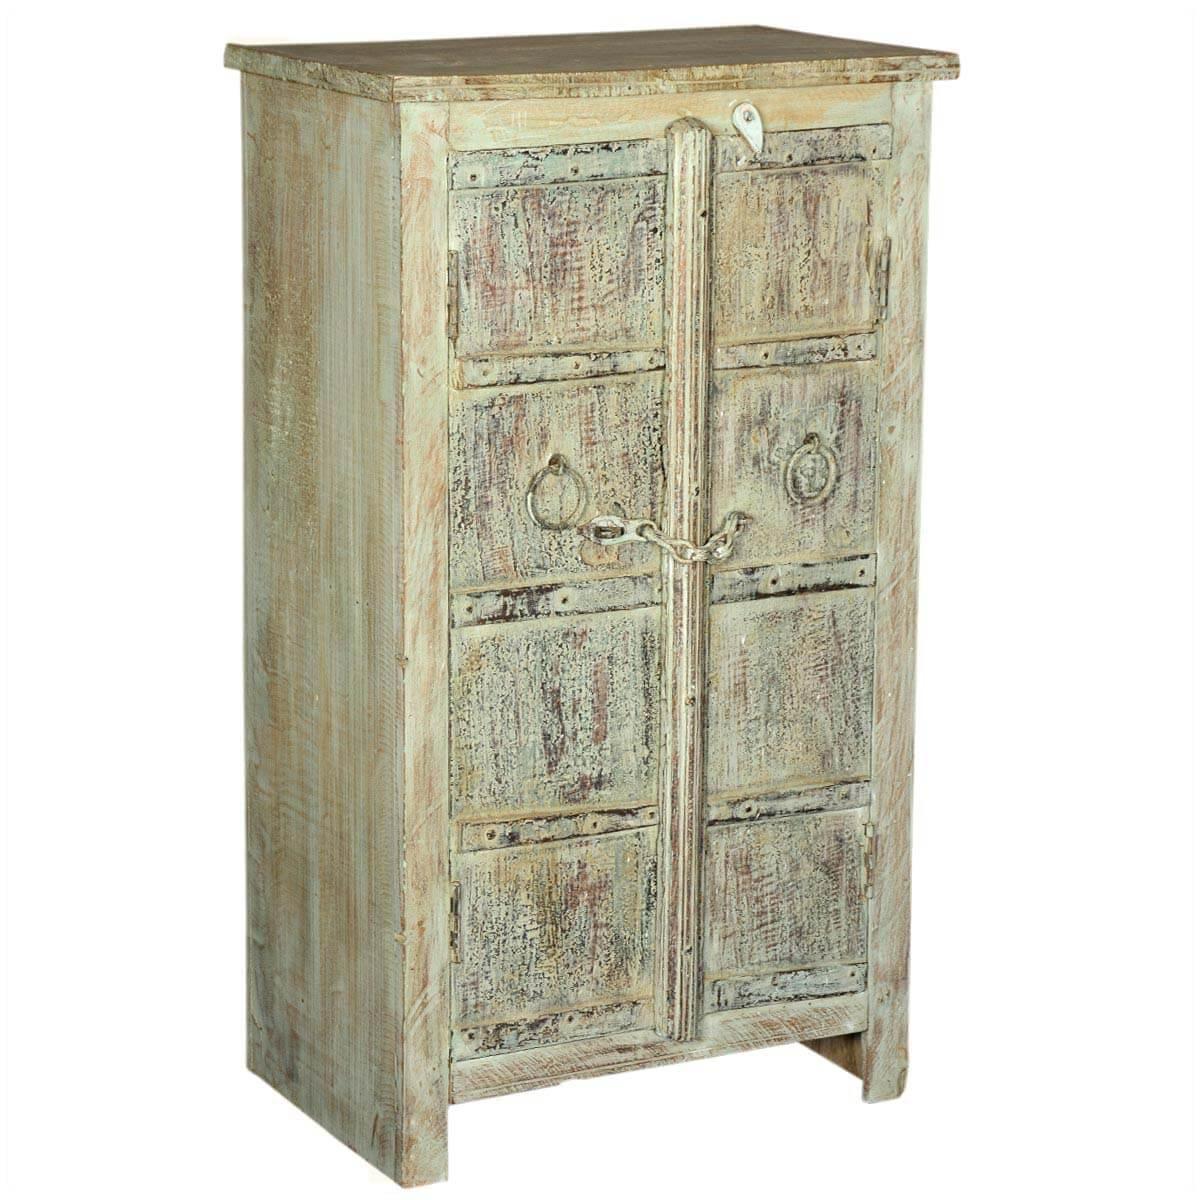 Dobson Rustic Reclaimed Wood Handcrafted 2 Door Accent Storage Cabinet